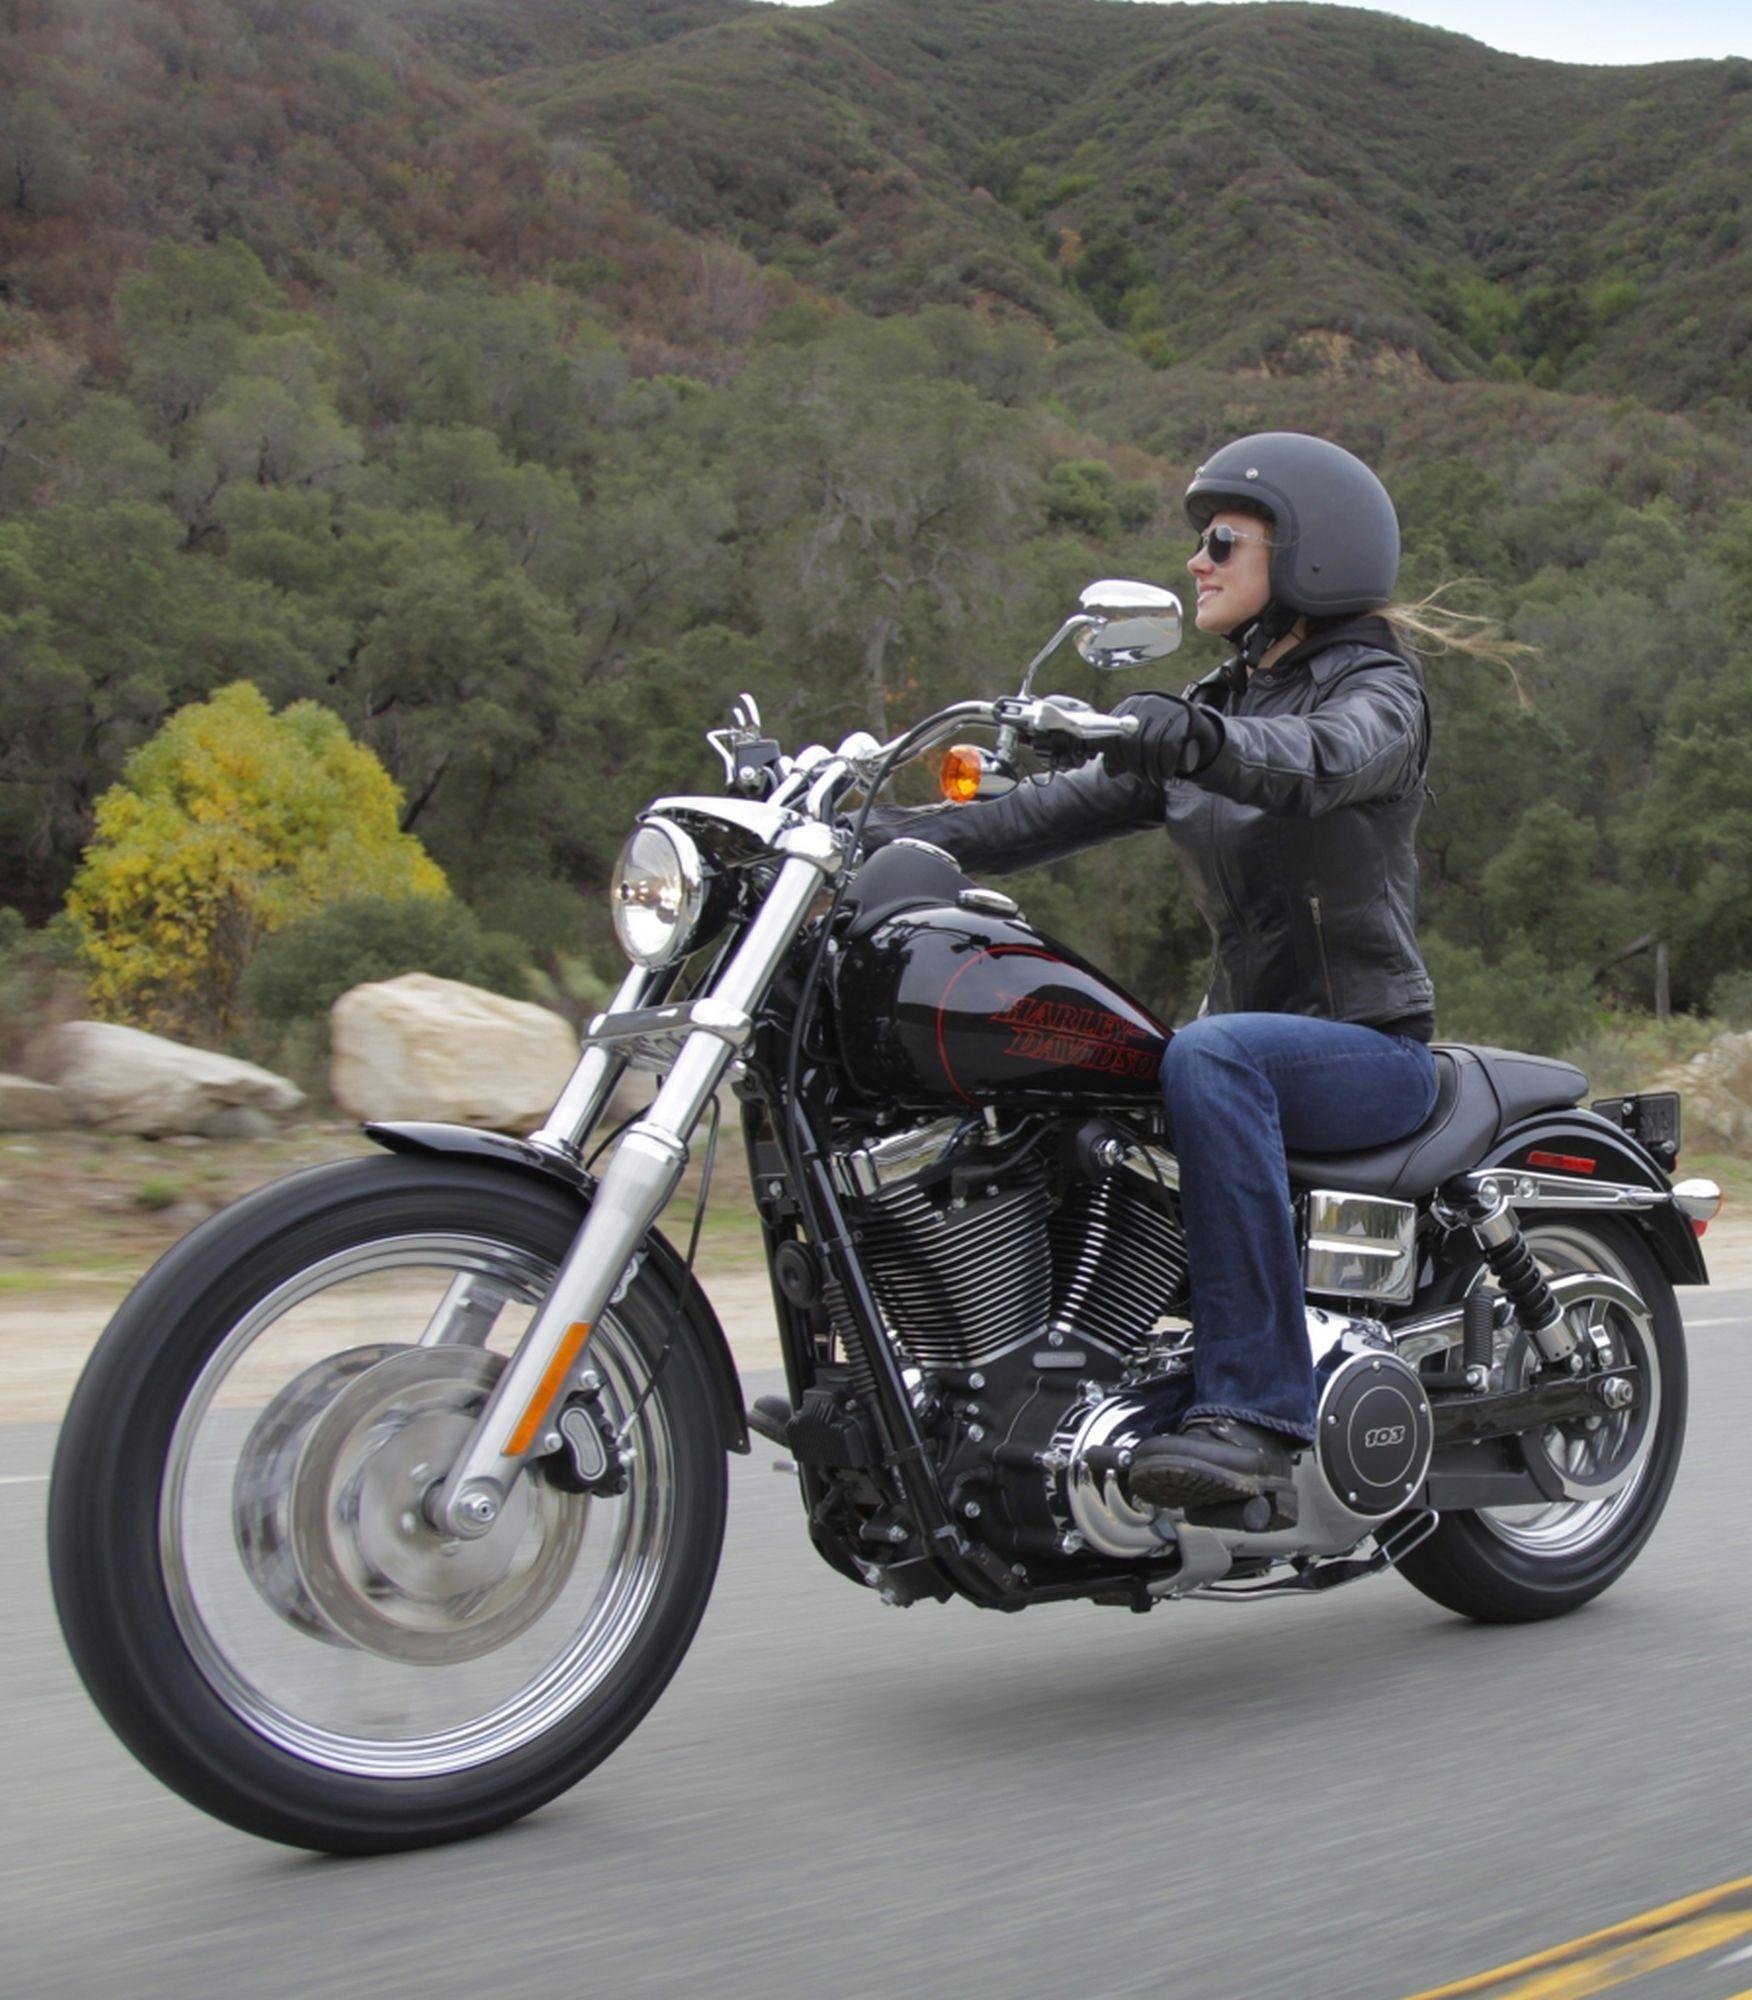 2006 Harley Dyna Low Rider Harley-davidson dyna low rider